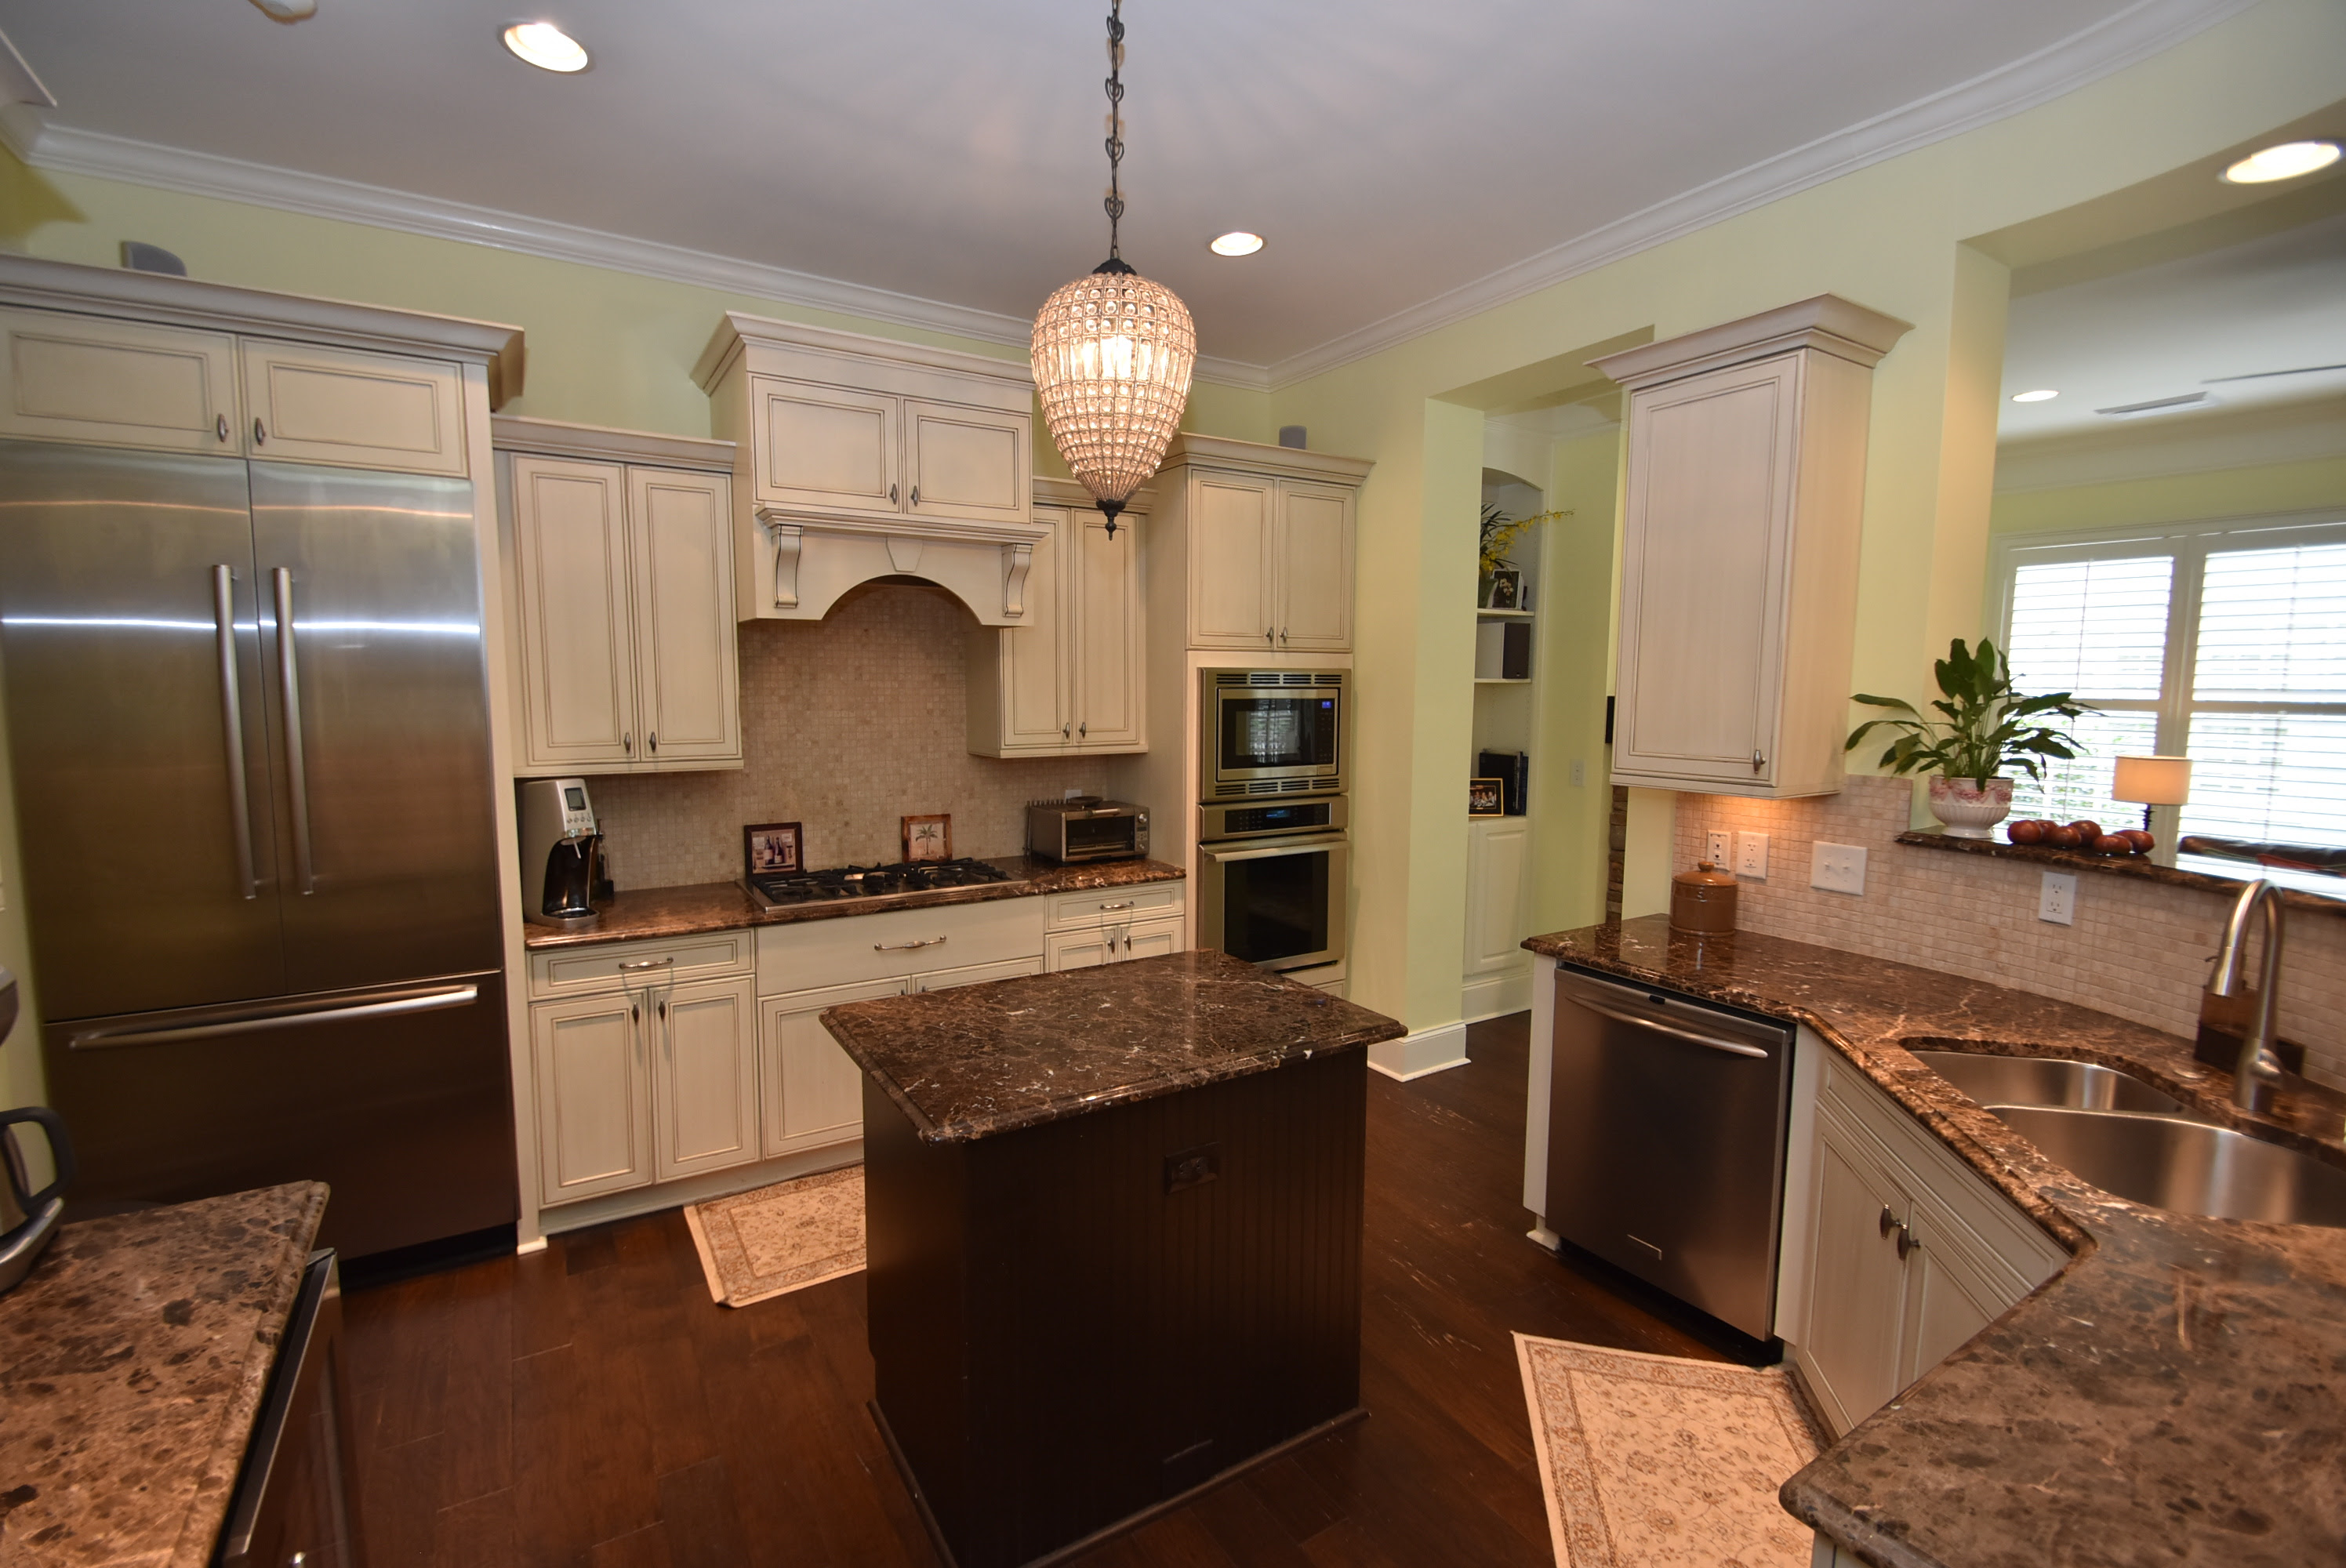 176 Ridgeland Dr Unit 101 Greenville Sc Real Estate For Sale